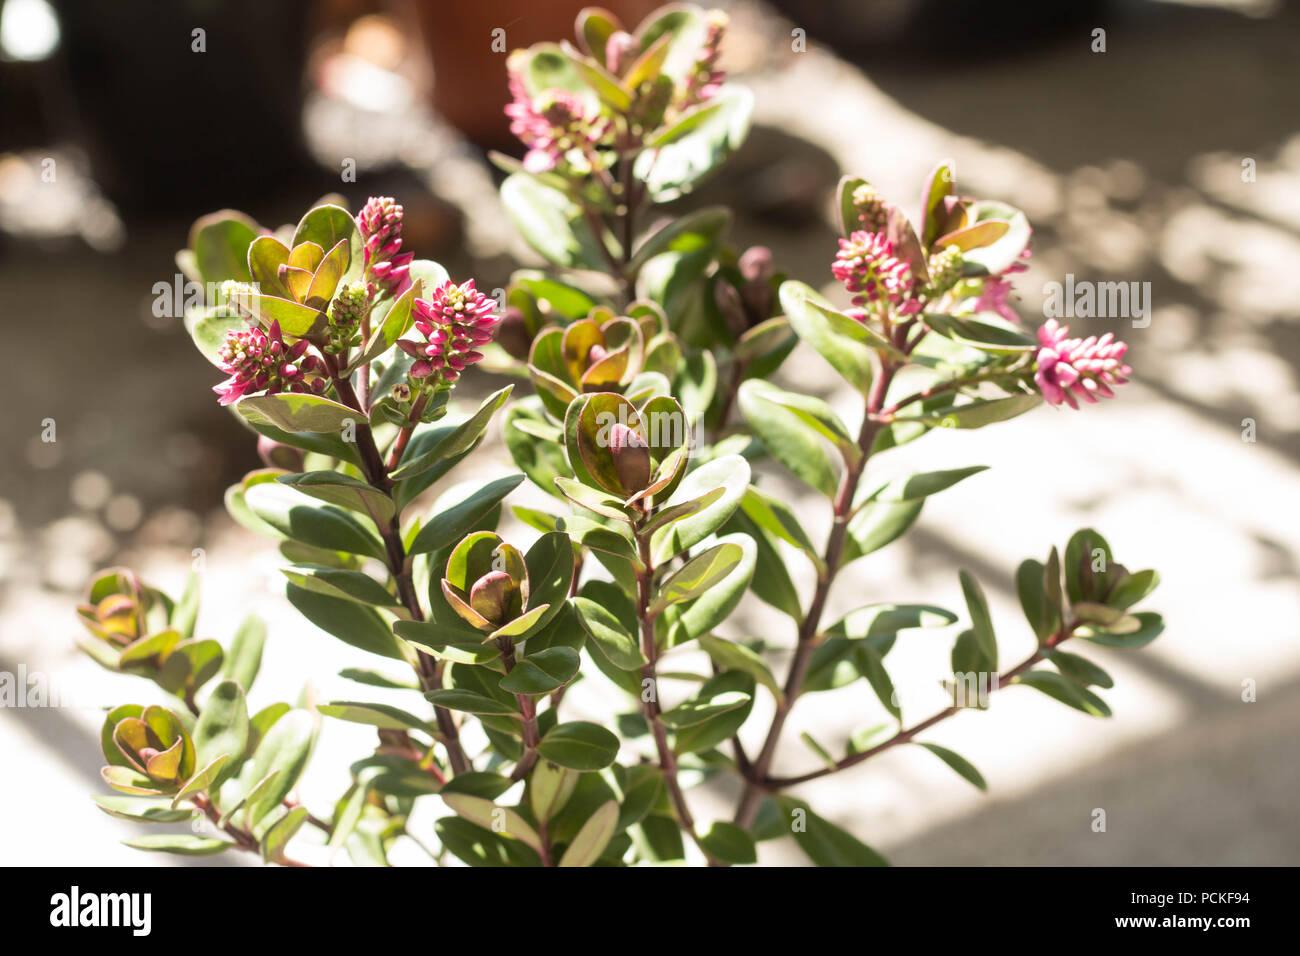 Urban spaces = Natural light across a Pink Hebe on a small urban balcony garden. - Stock Image